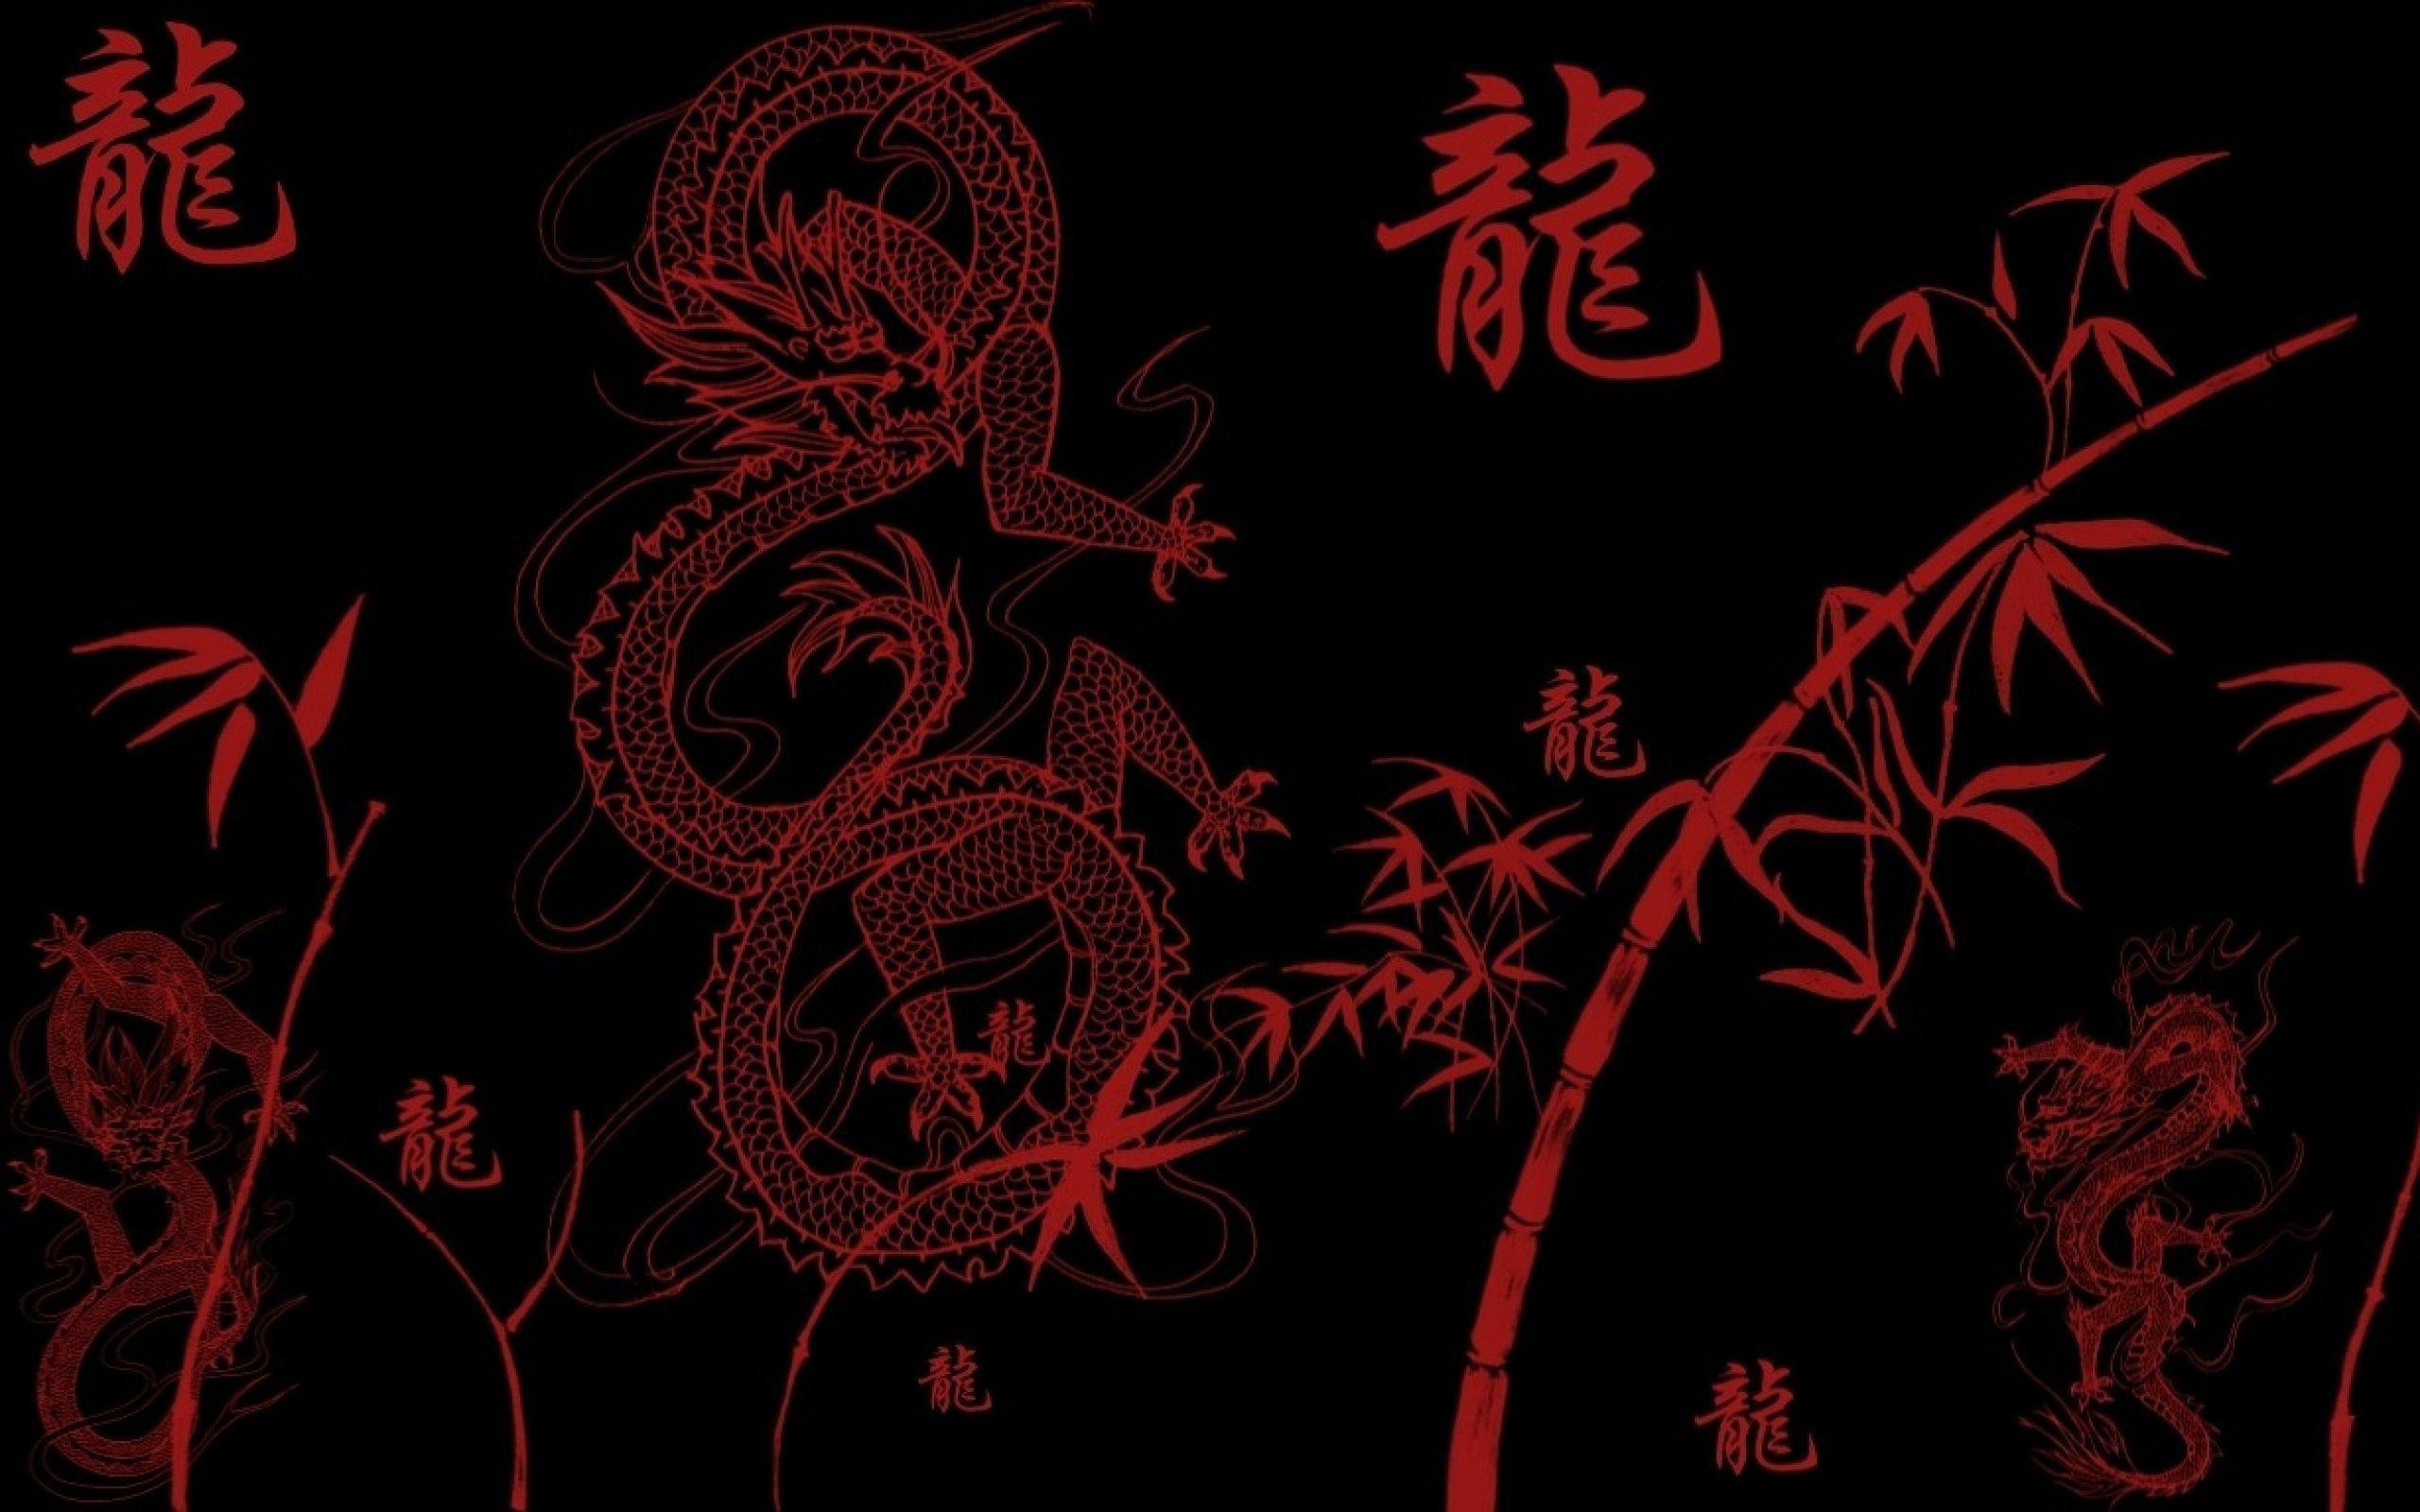 Dragon Aesthetic Desktop Wallpapers Top Free Dragon Aesthetic Desktop Backgrounds Wallpaperaccess